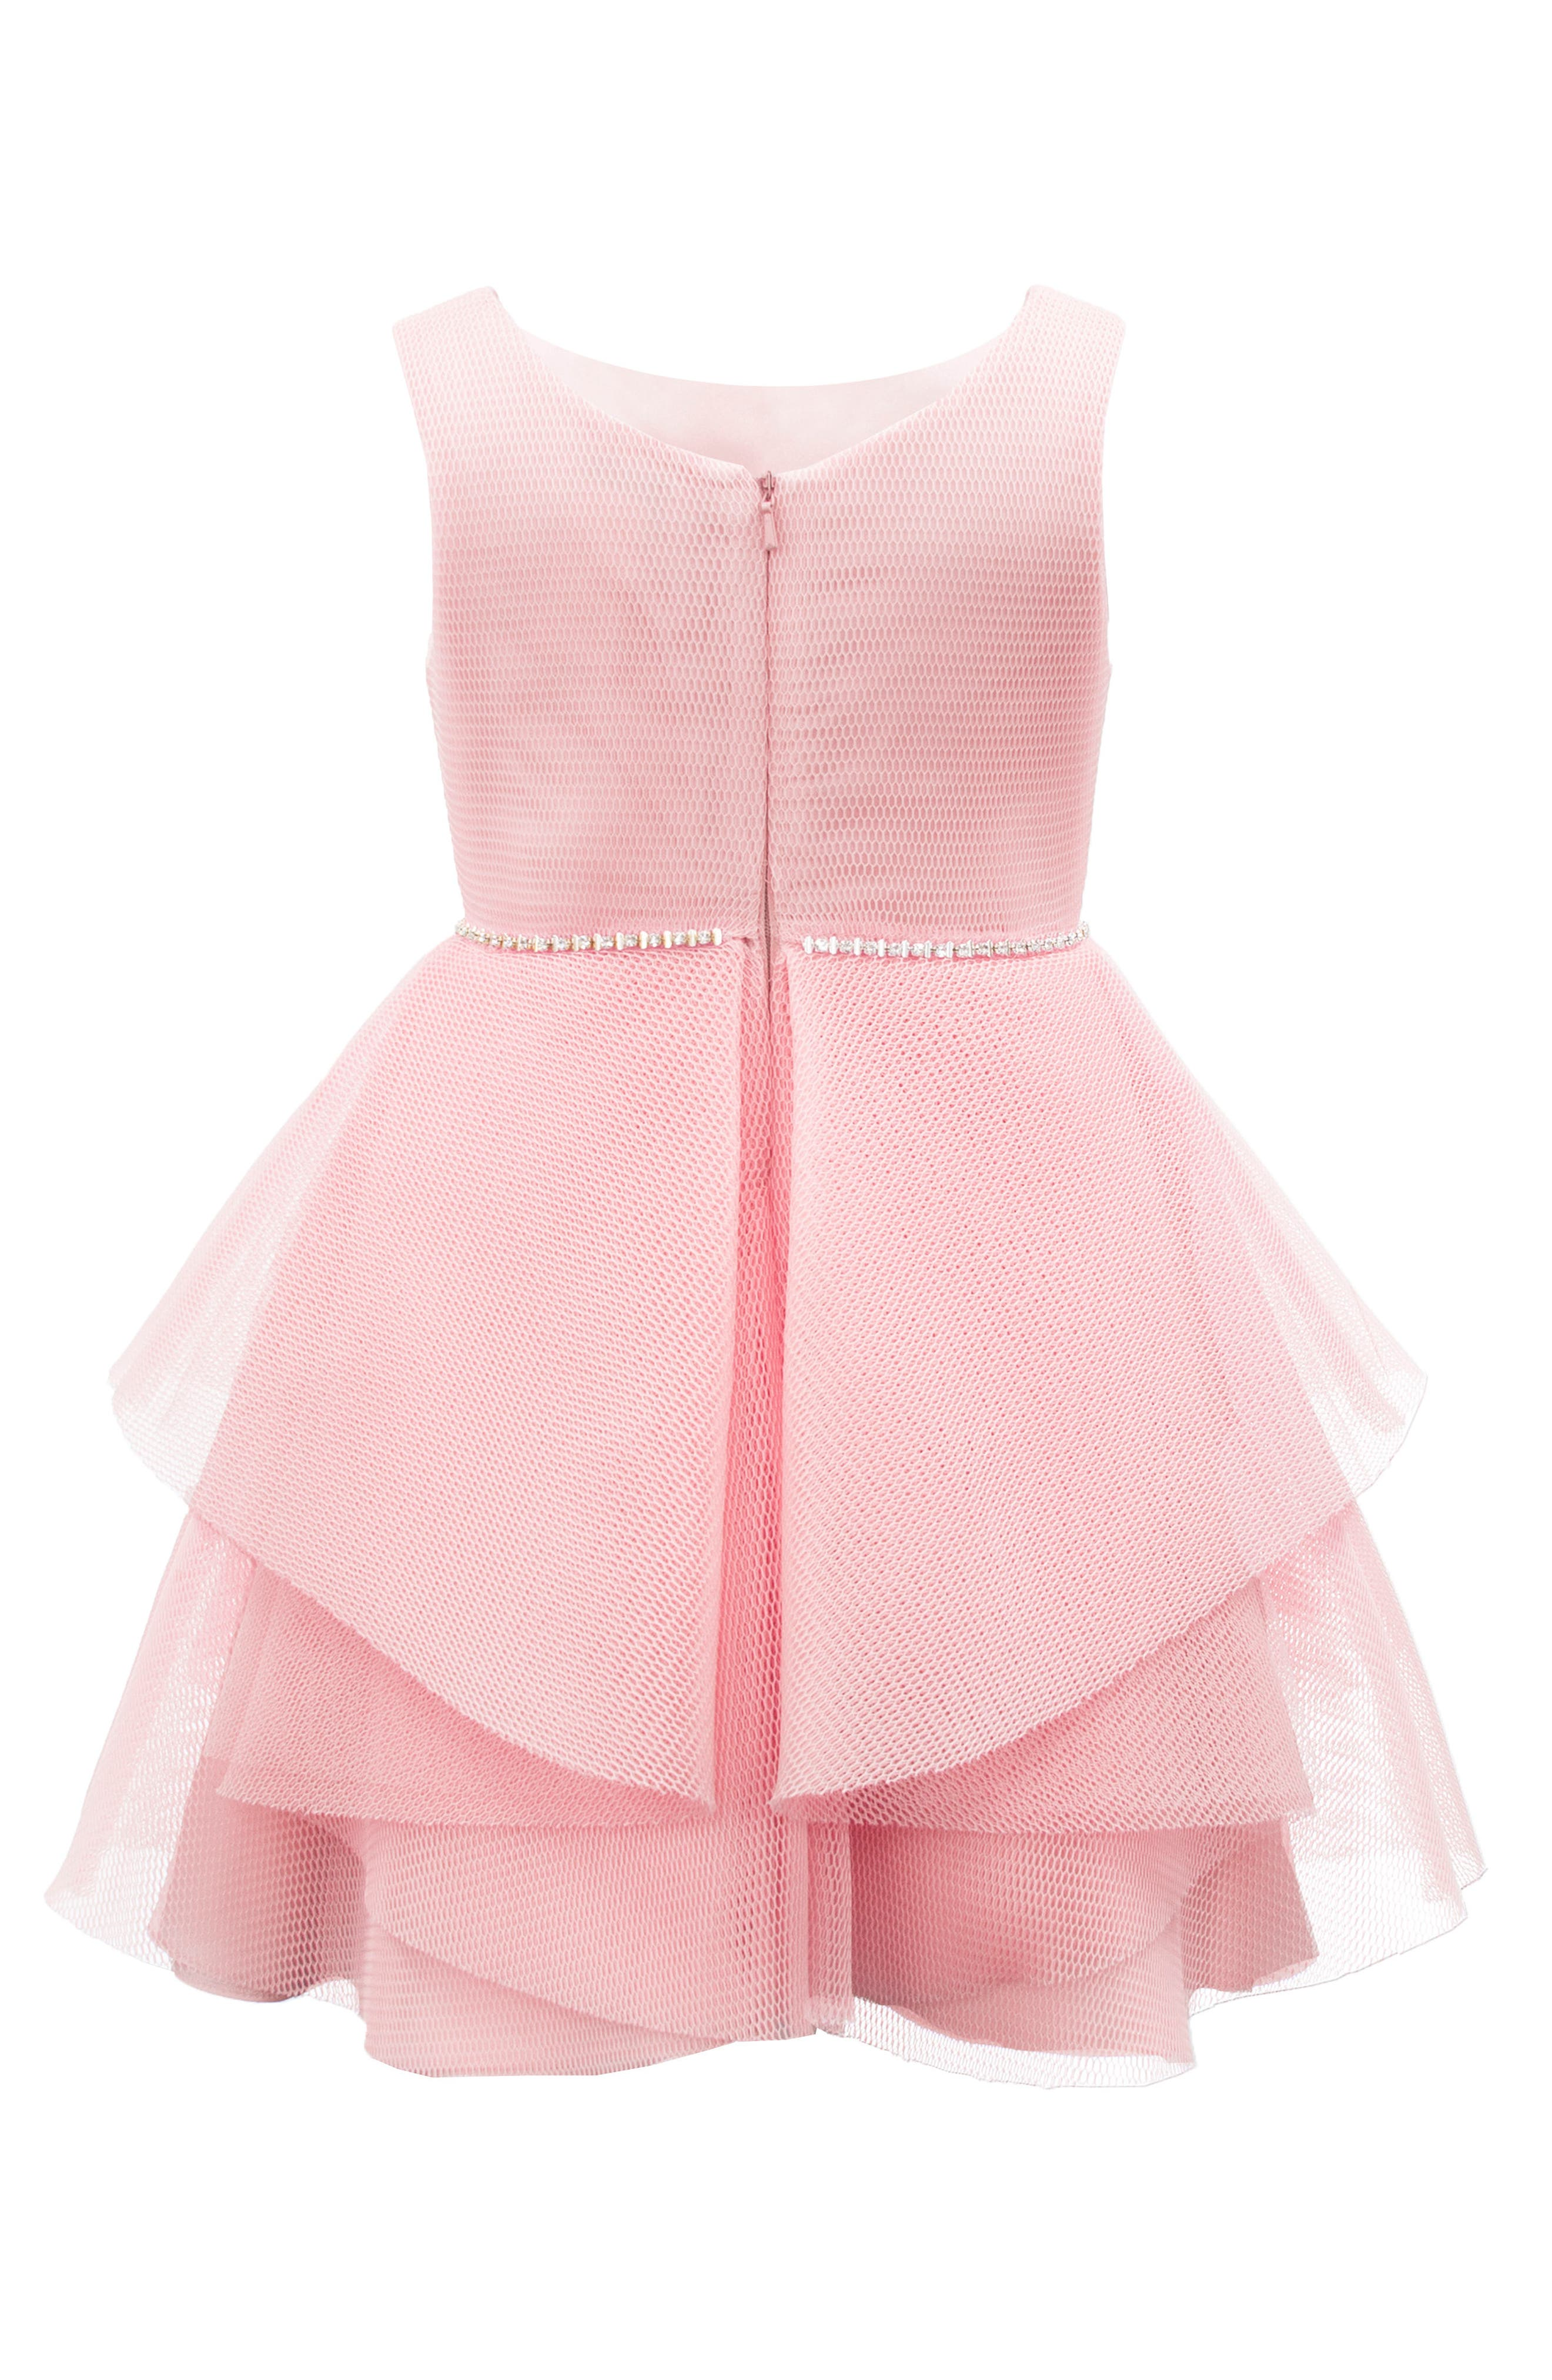 Wrapover Mesh Dress,                             Alternate thumbnail 2, color,                             660